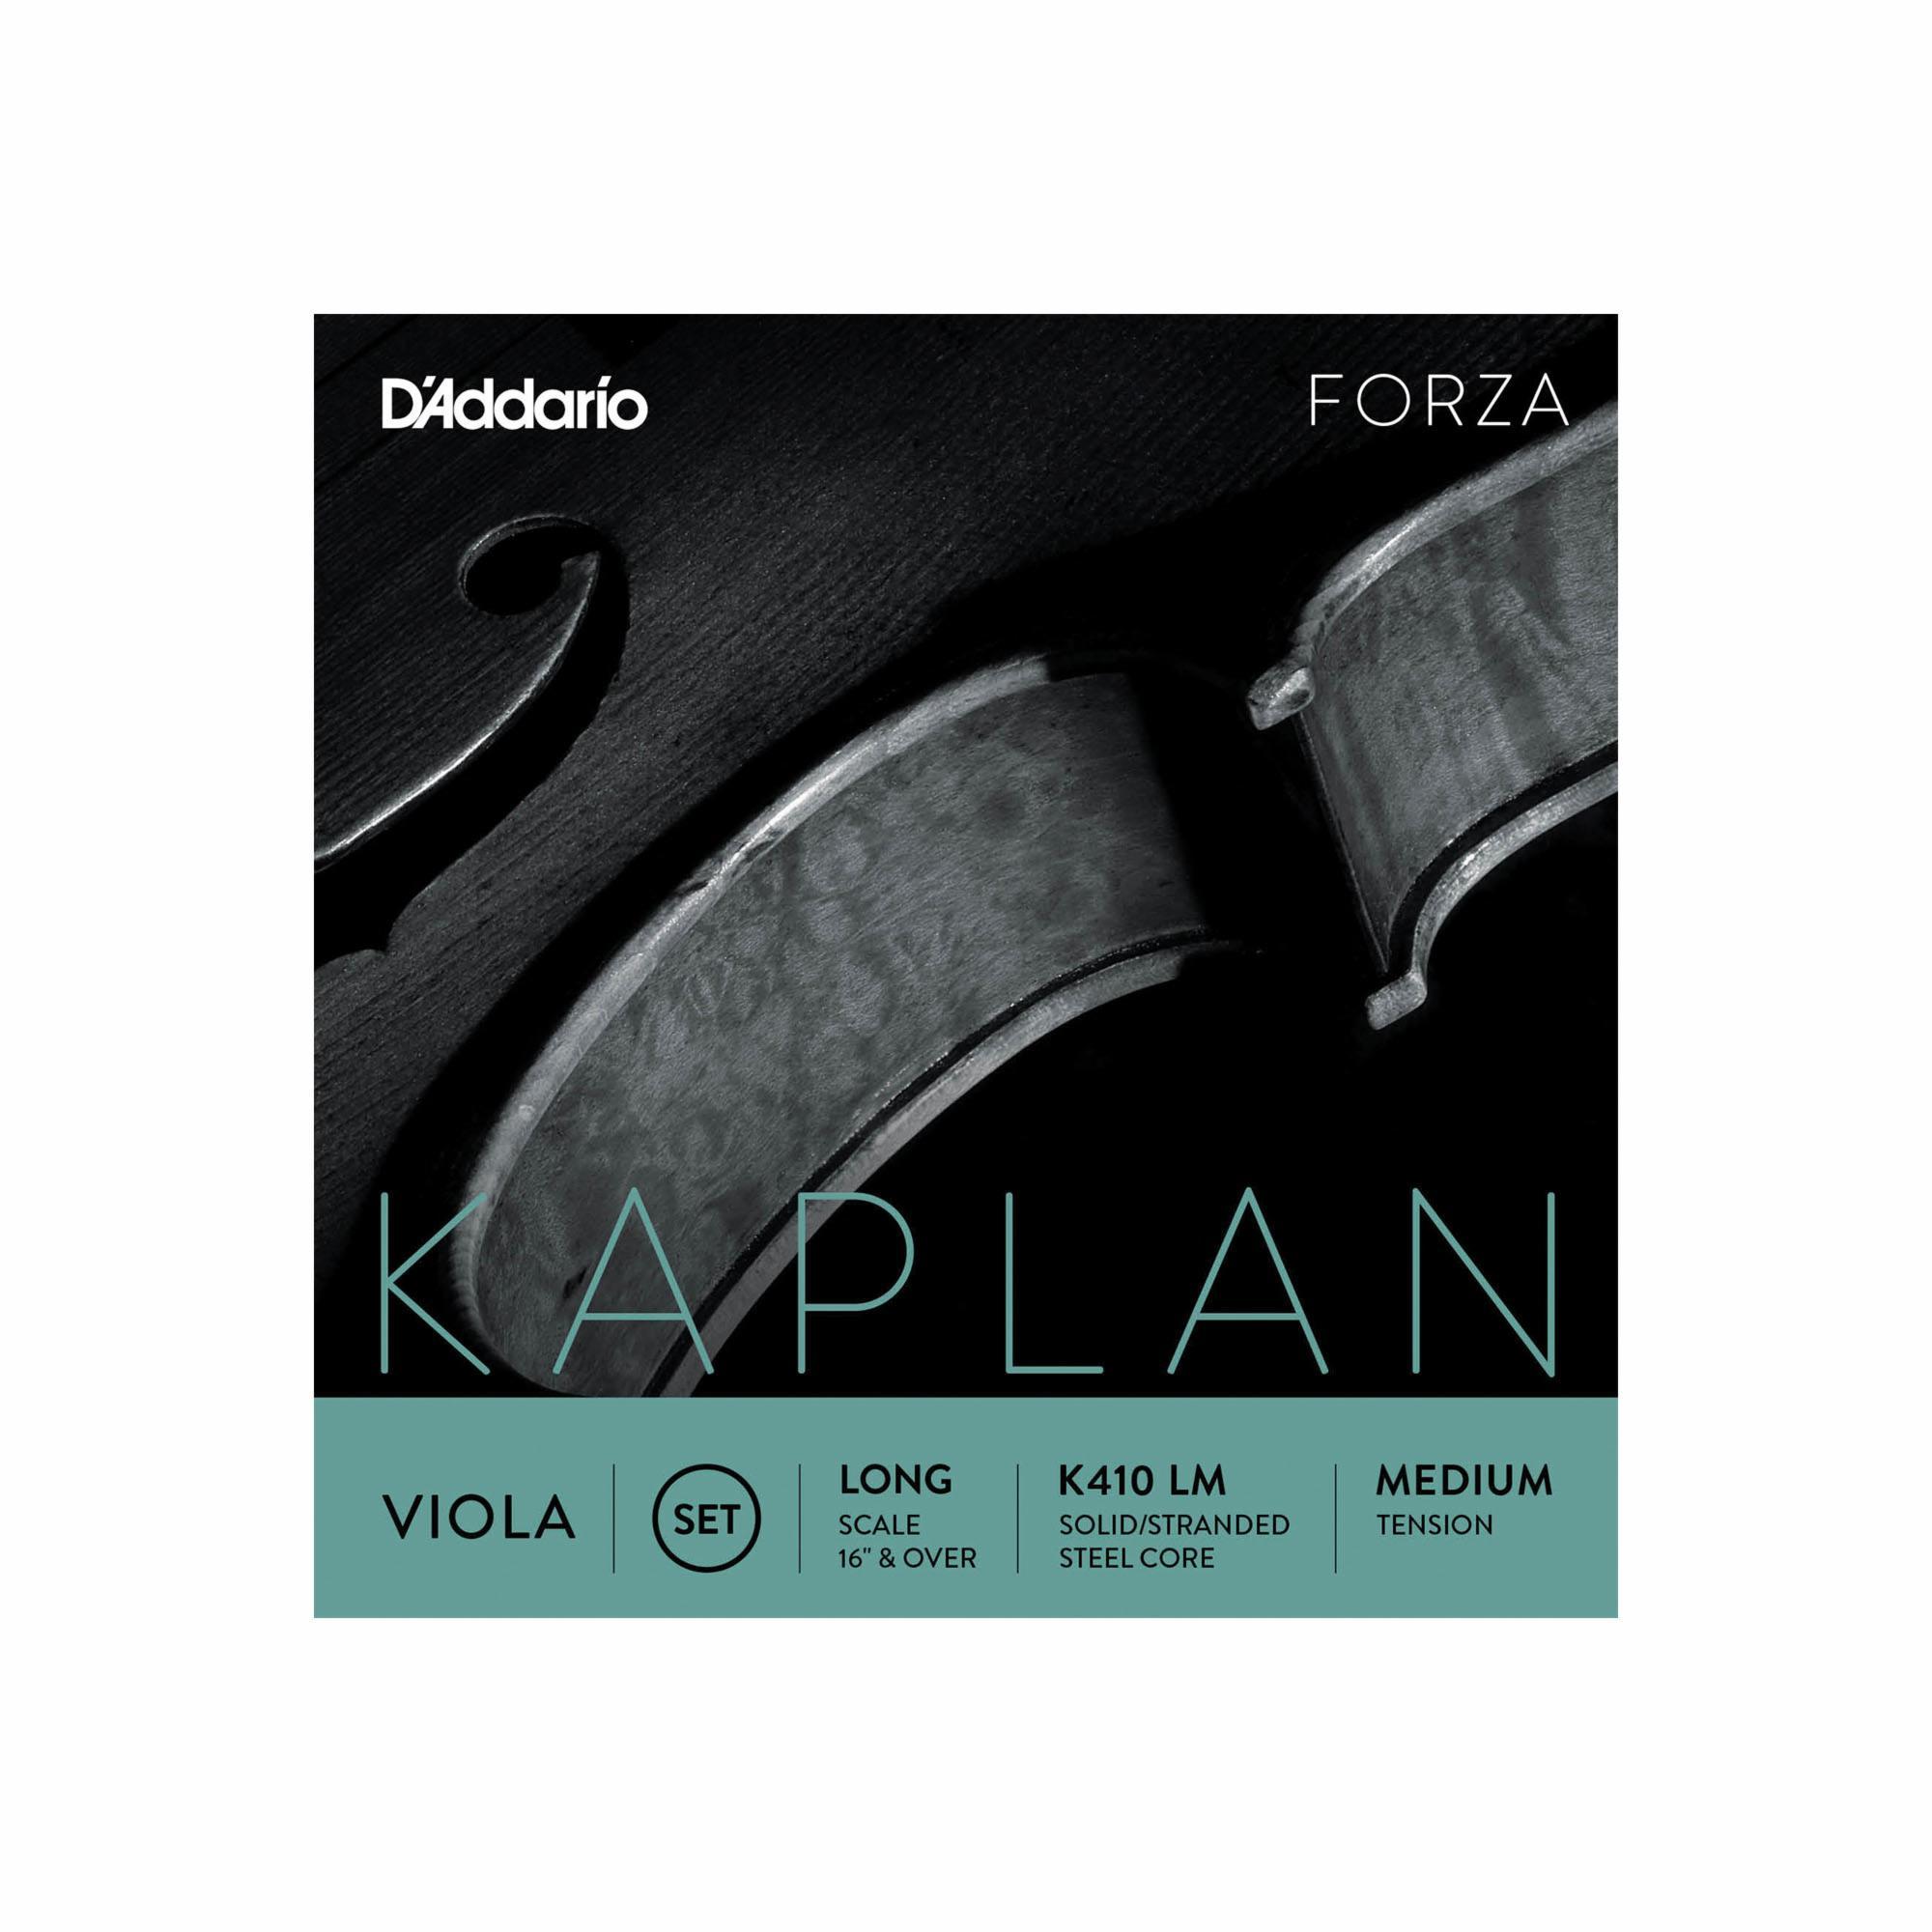 D'Addario Kaplan Viola Strings